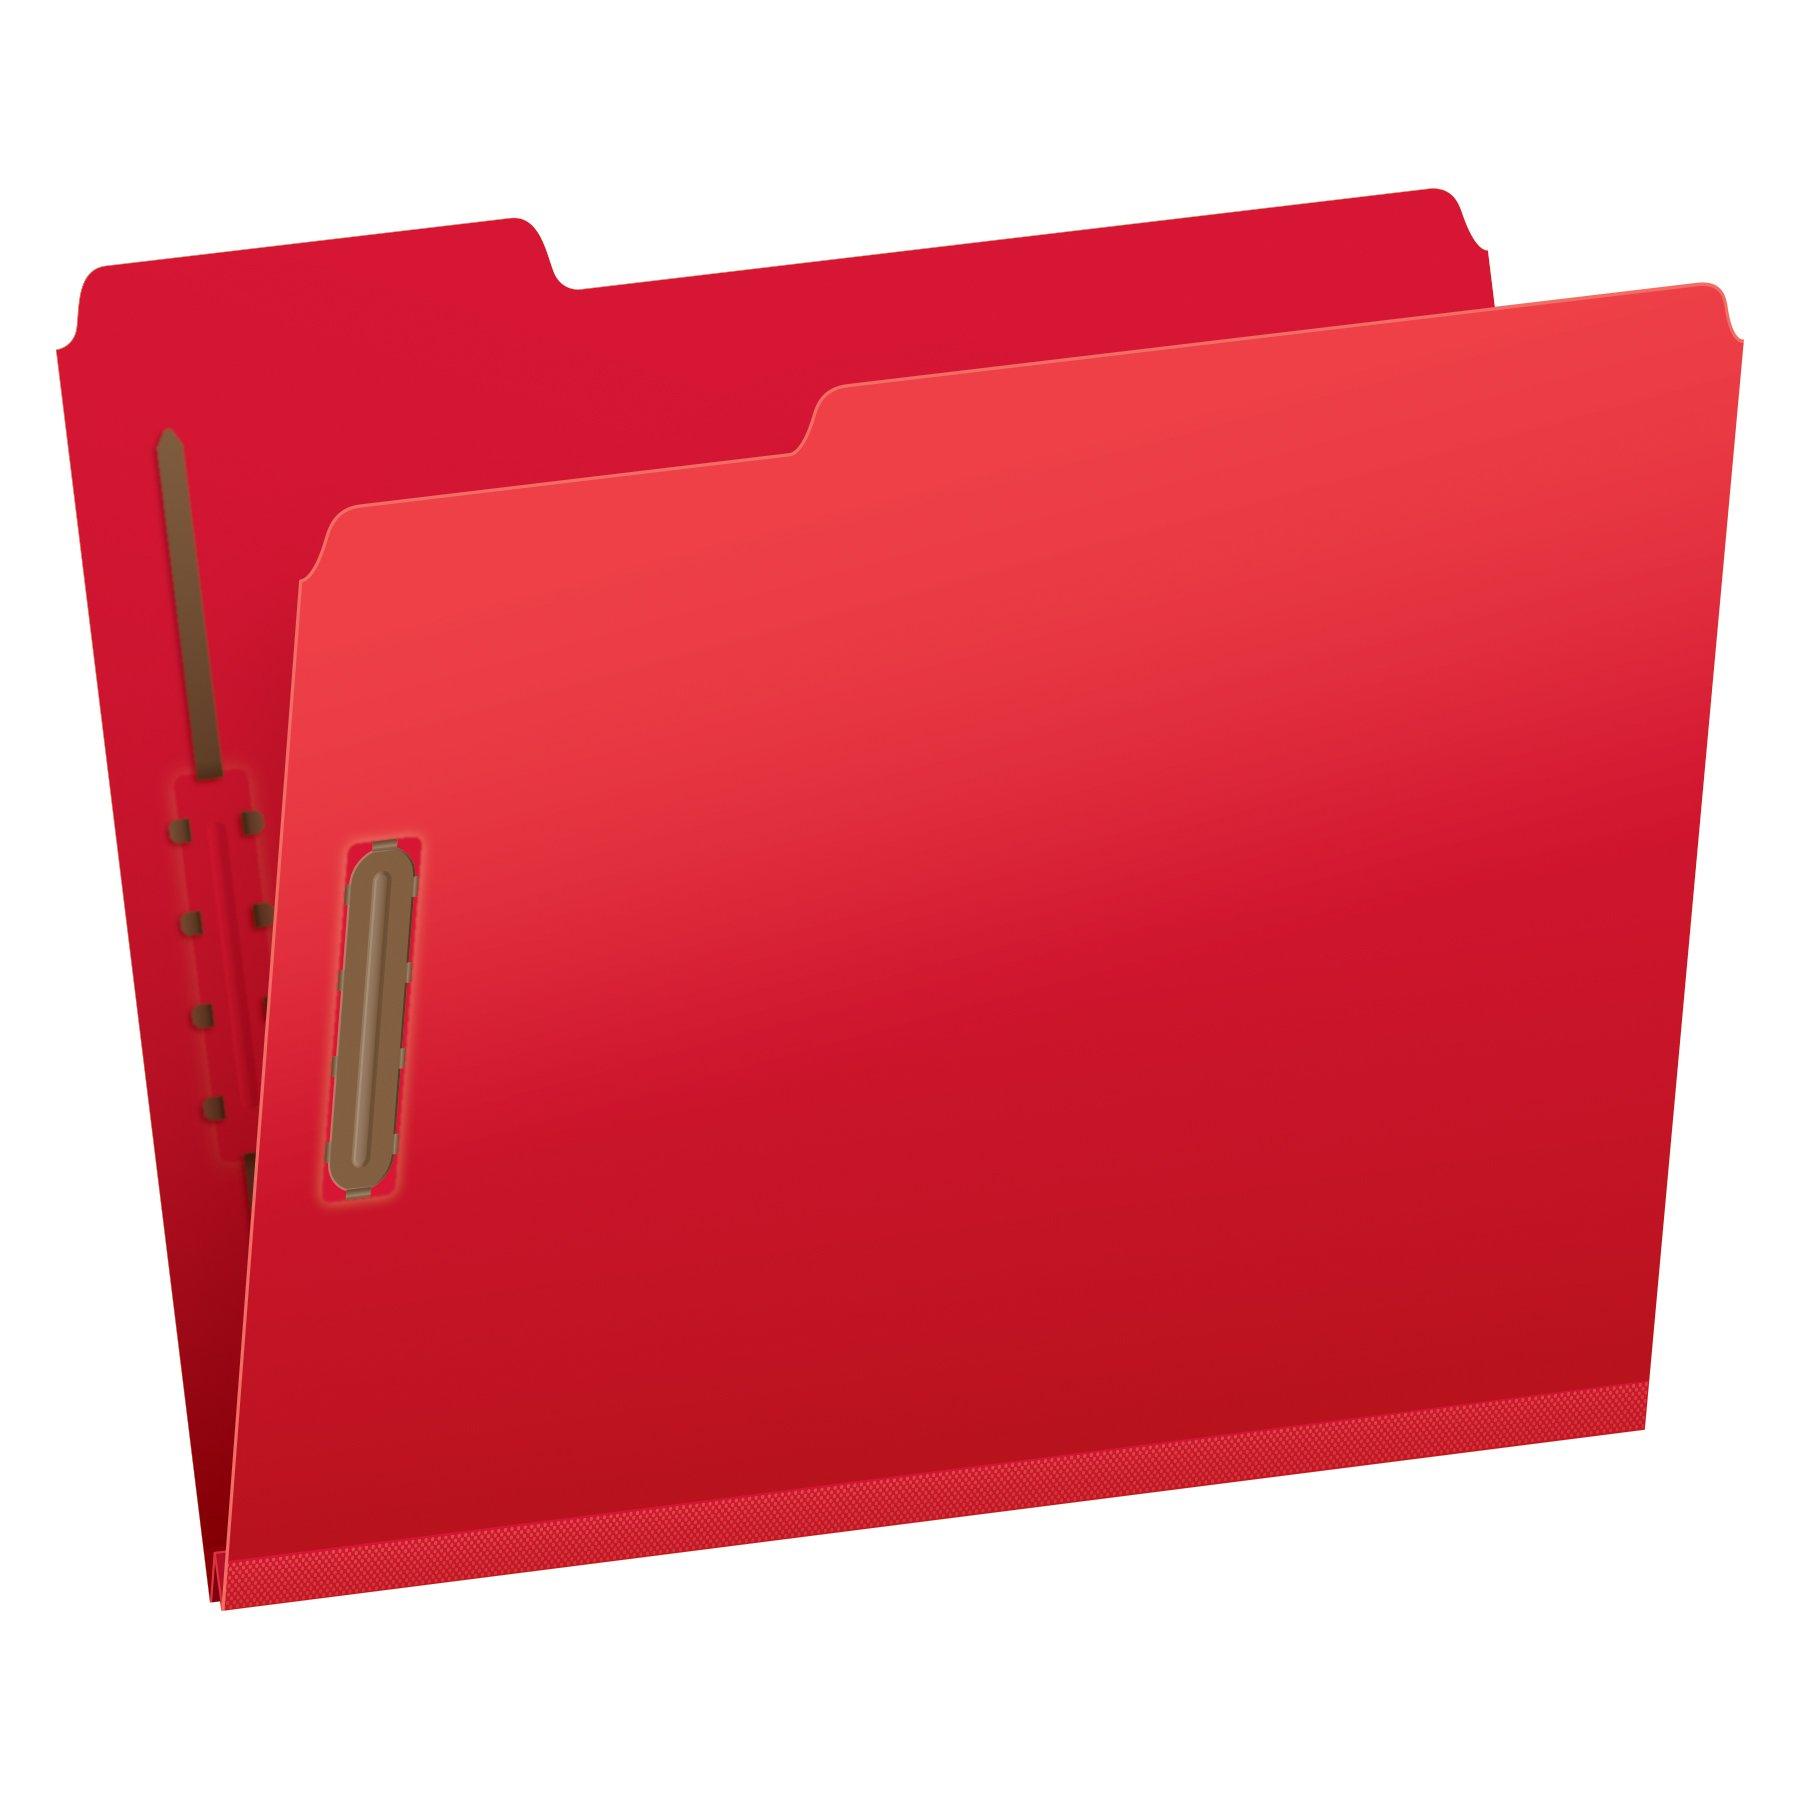 Pendaflex Pressboard Fastener Folders, Letter Size, Bright Red, 2'' Expansion, 1/3 Cut, 25/BX (15936GW) by Globe Weis